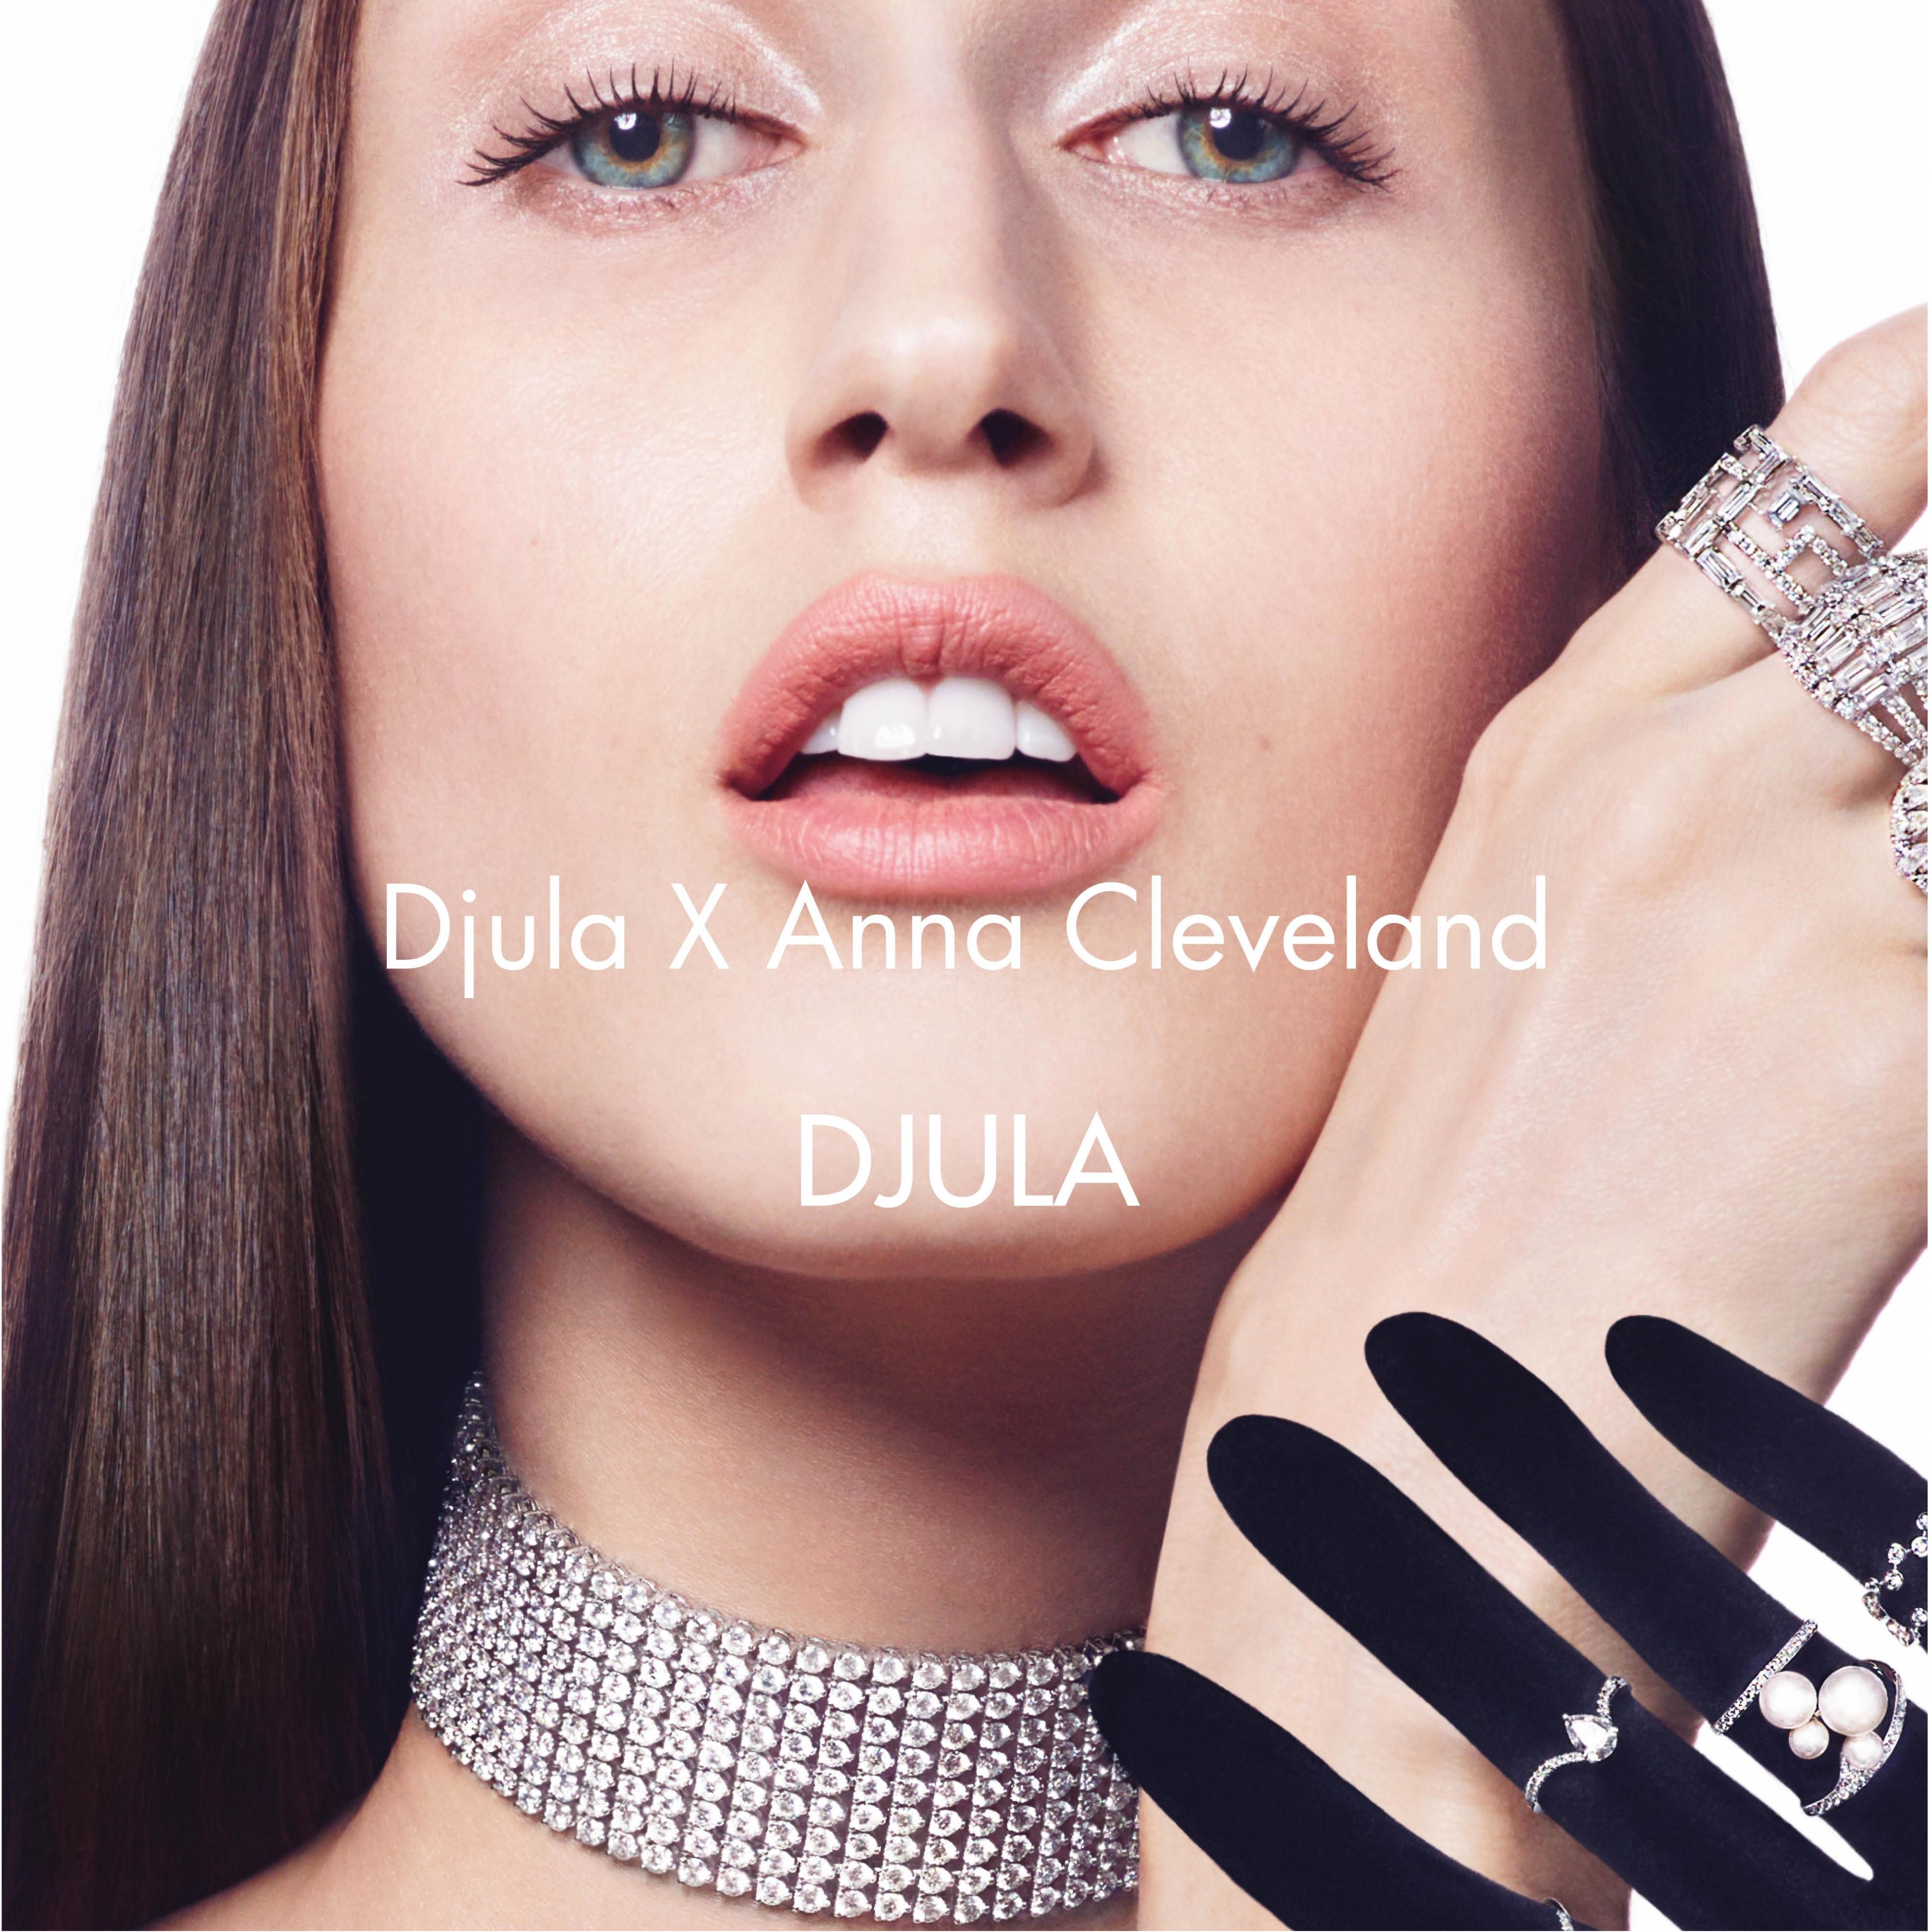 DJULA X ANNA CLEVELAND